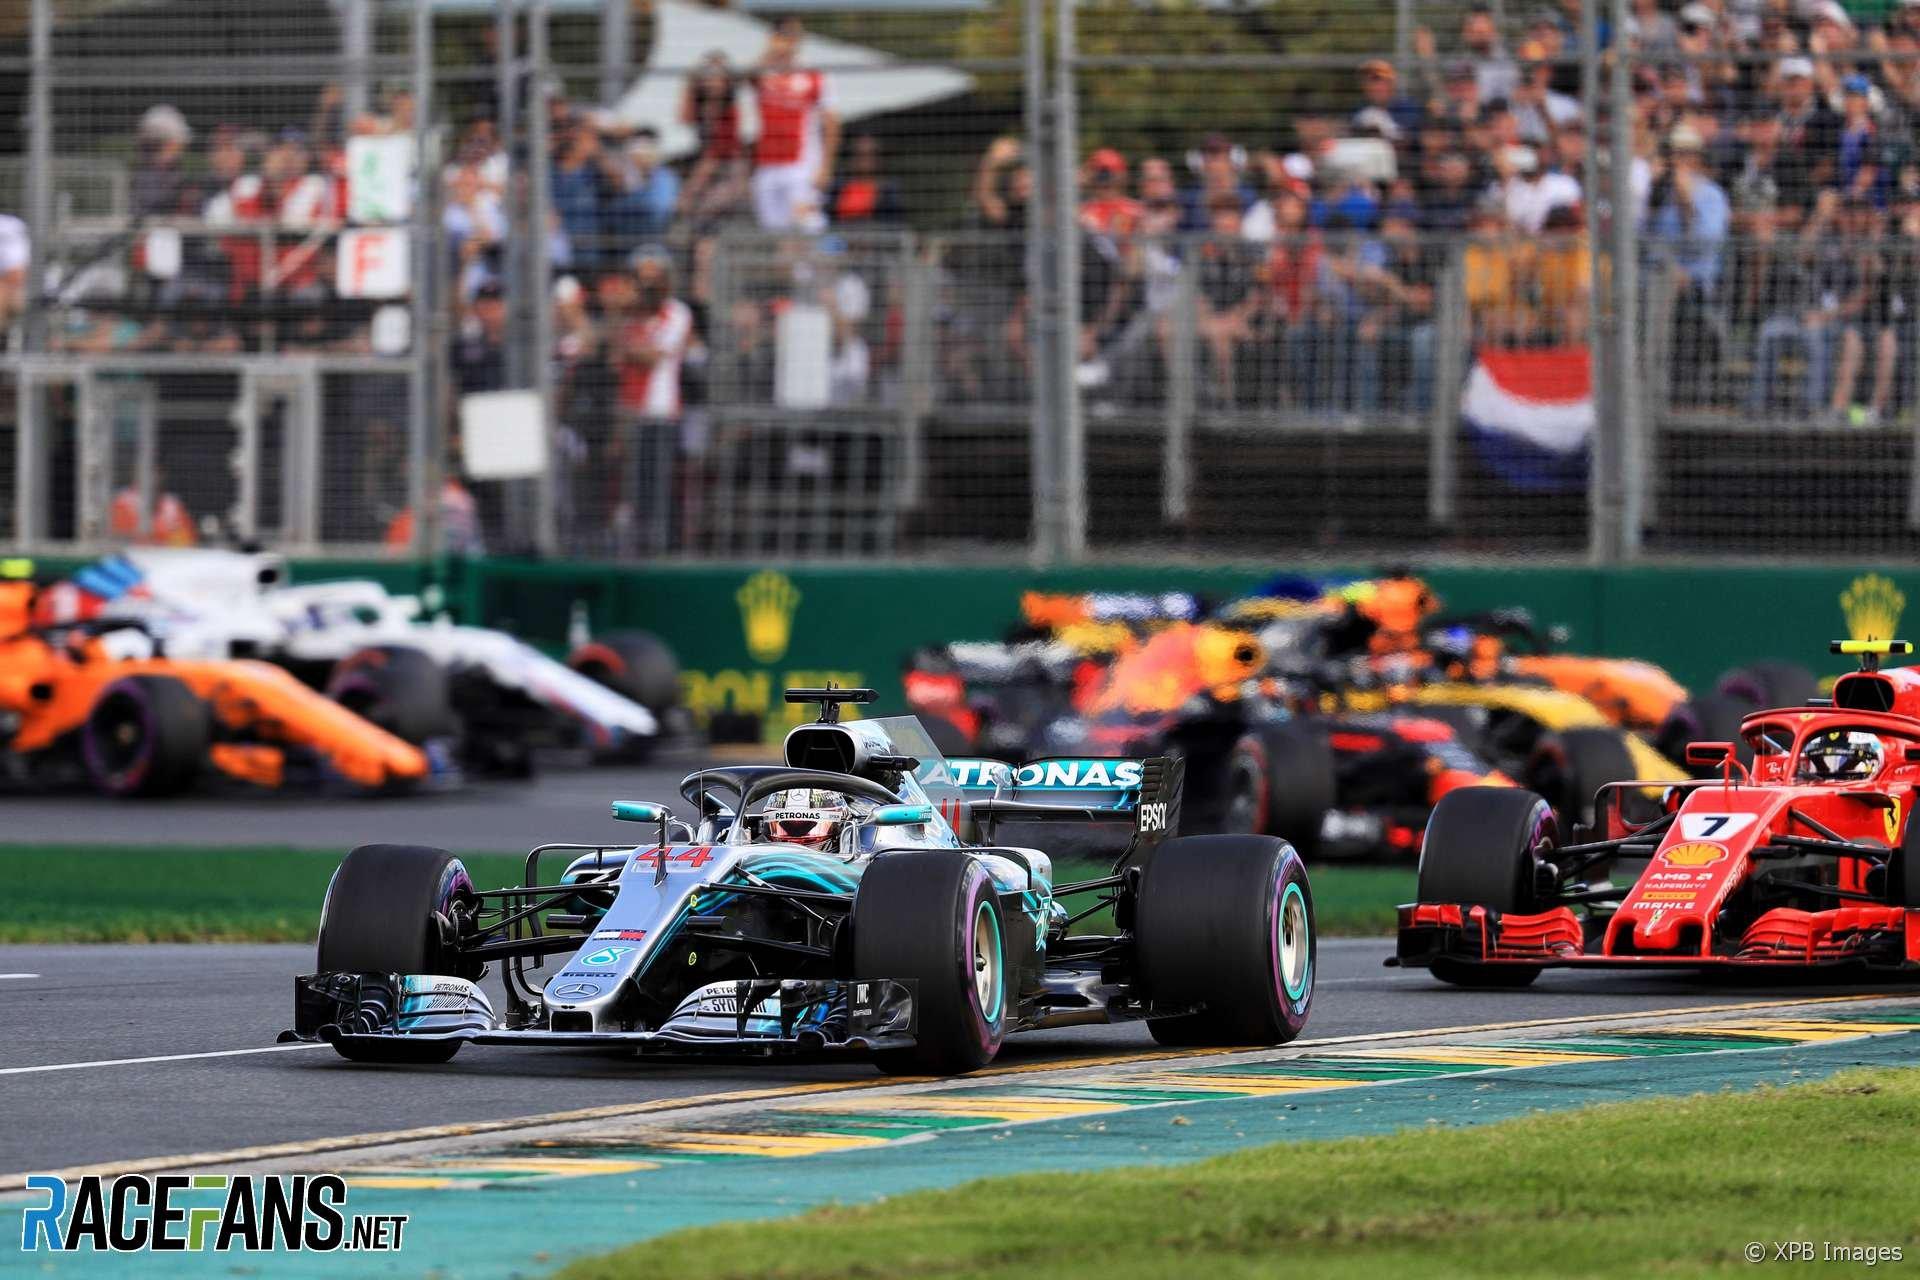 2019 Australian Grand Prix Live F1 Tv Times – Racefans F1 Calendar 2019 Channel 4